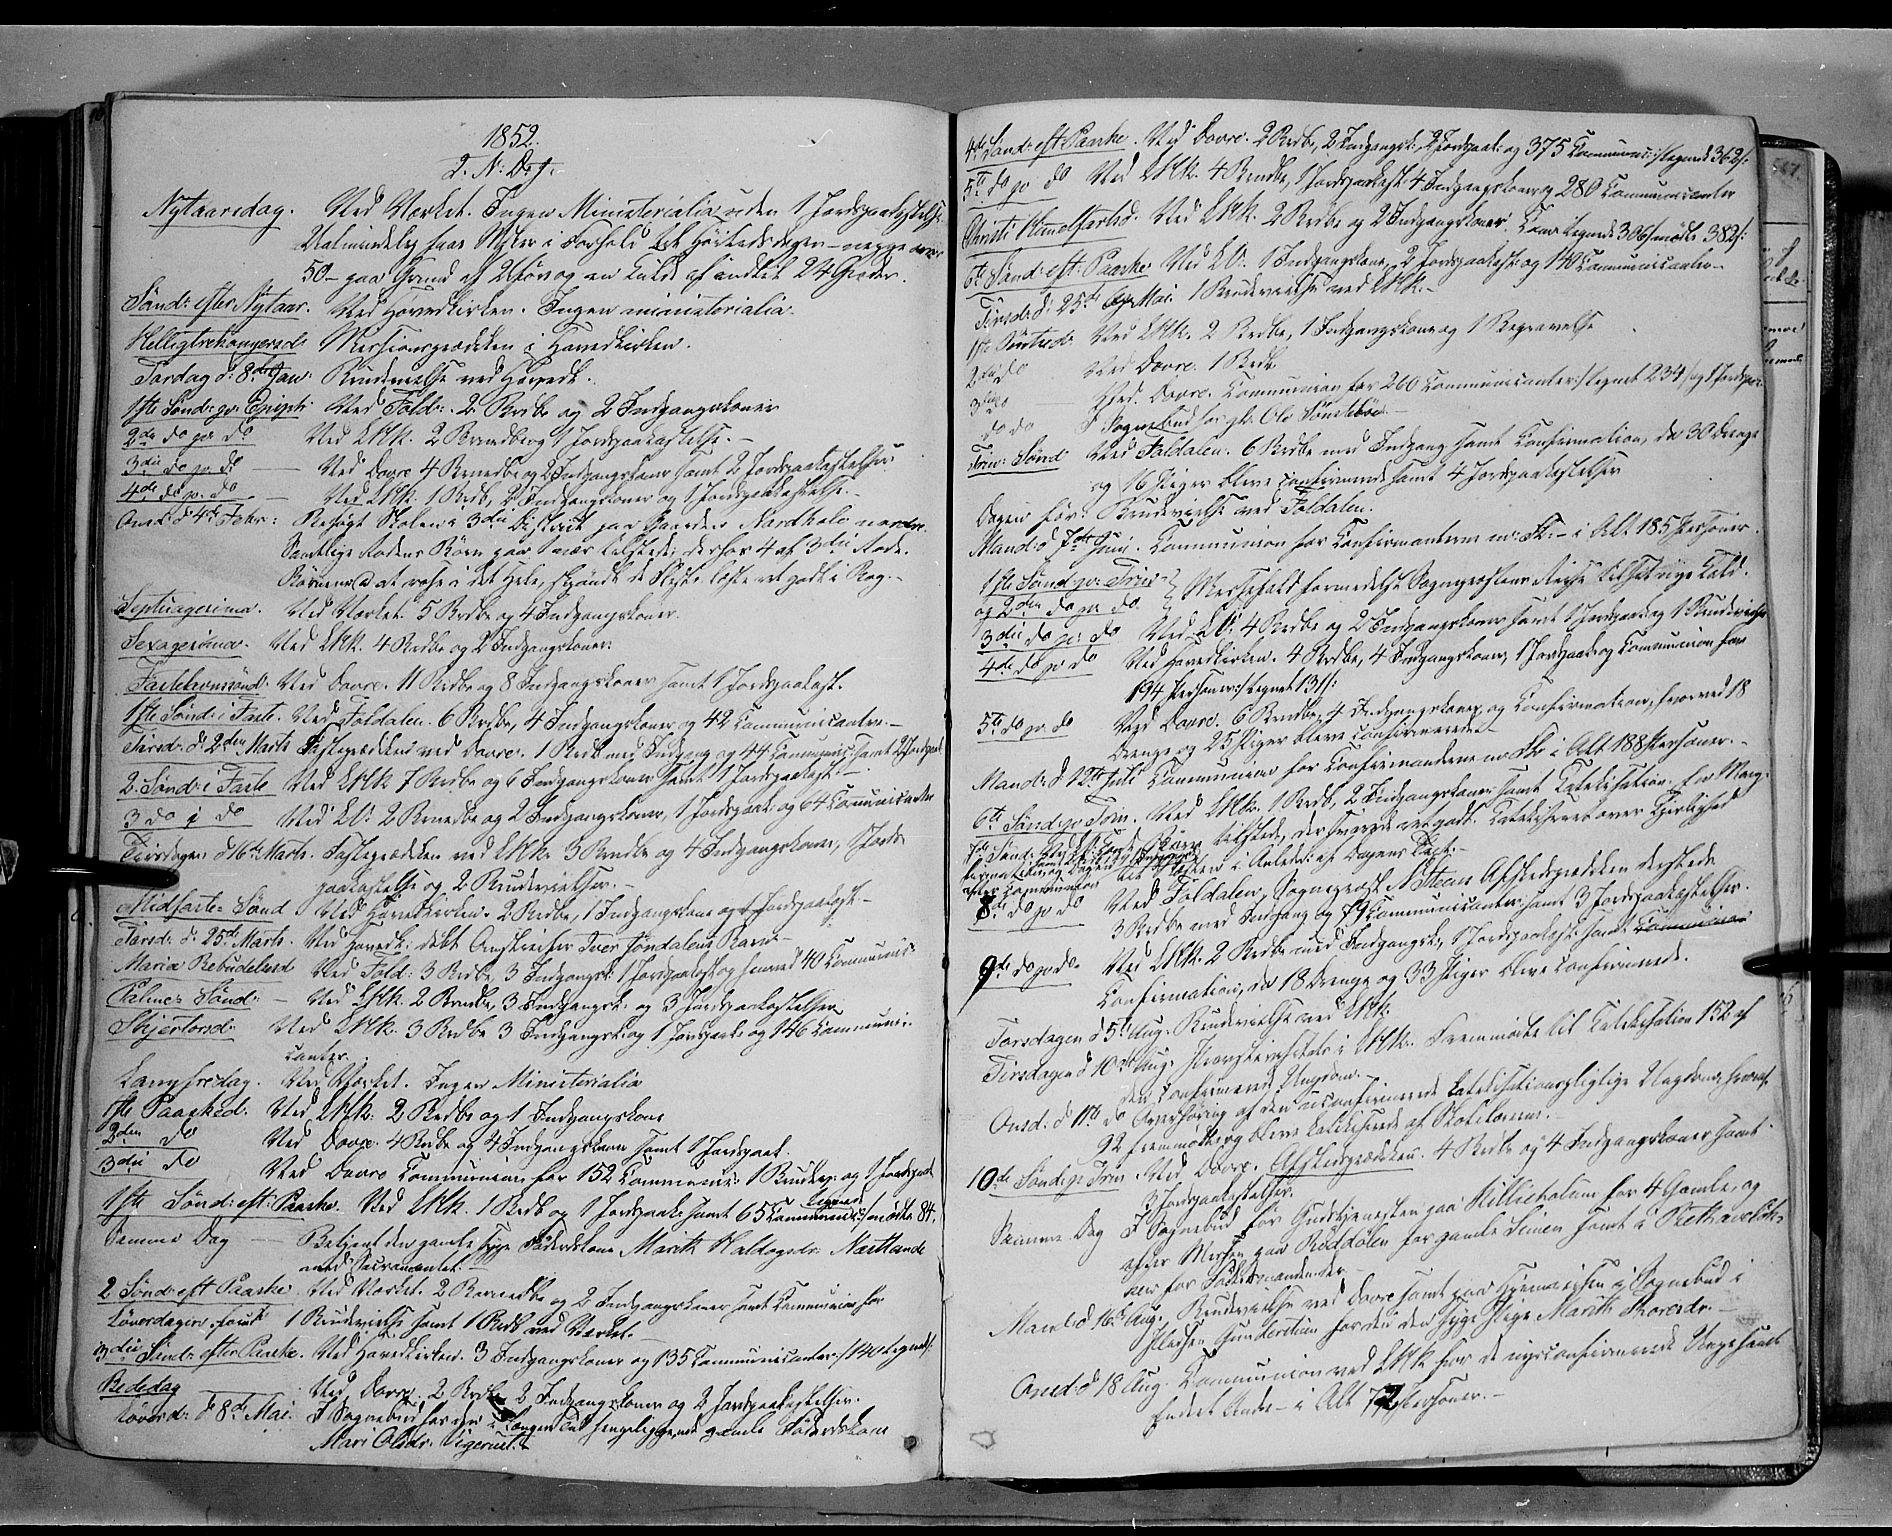 SAH, Lesja prestekontor, Ministerialbok nr. 6B, 1843-1854